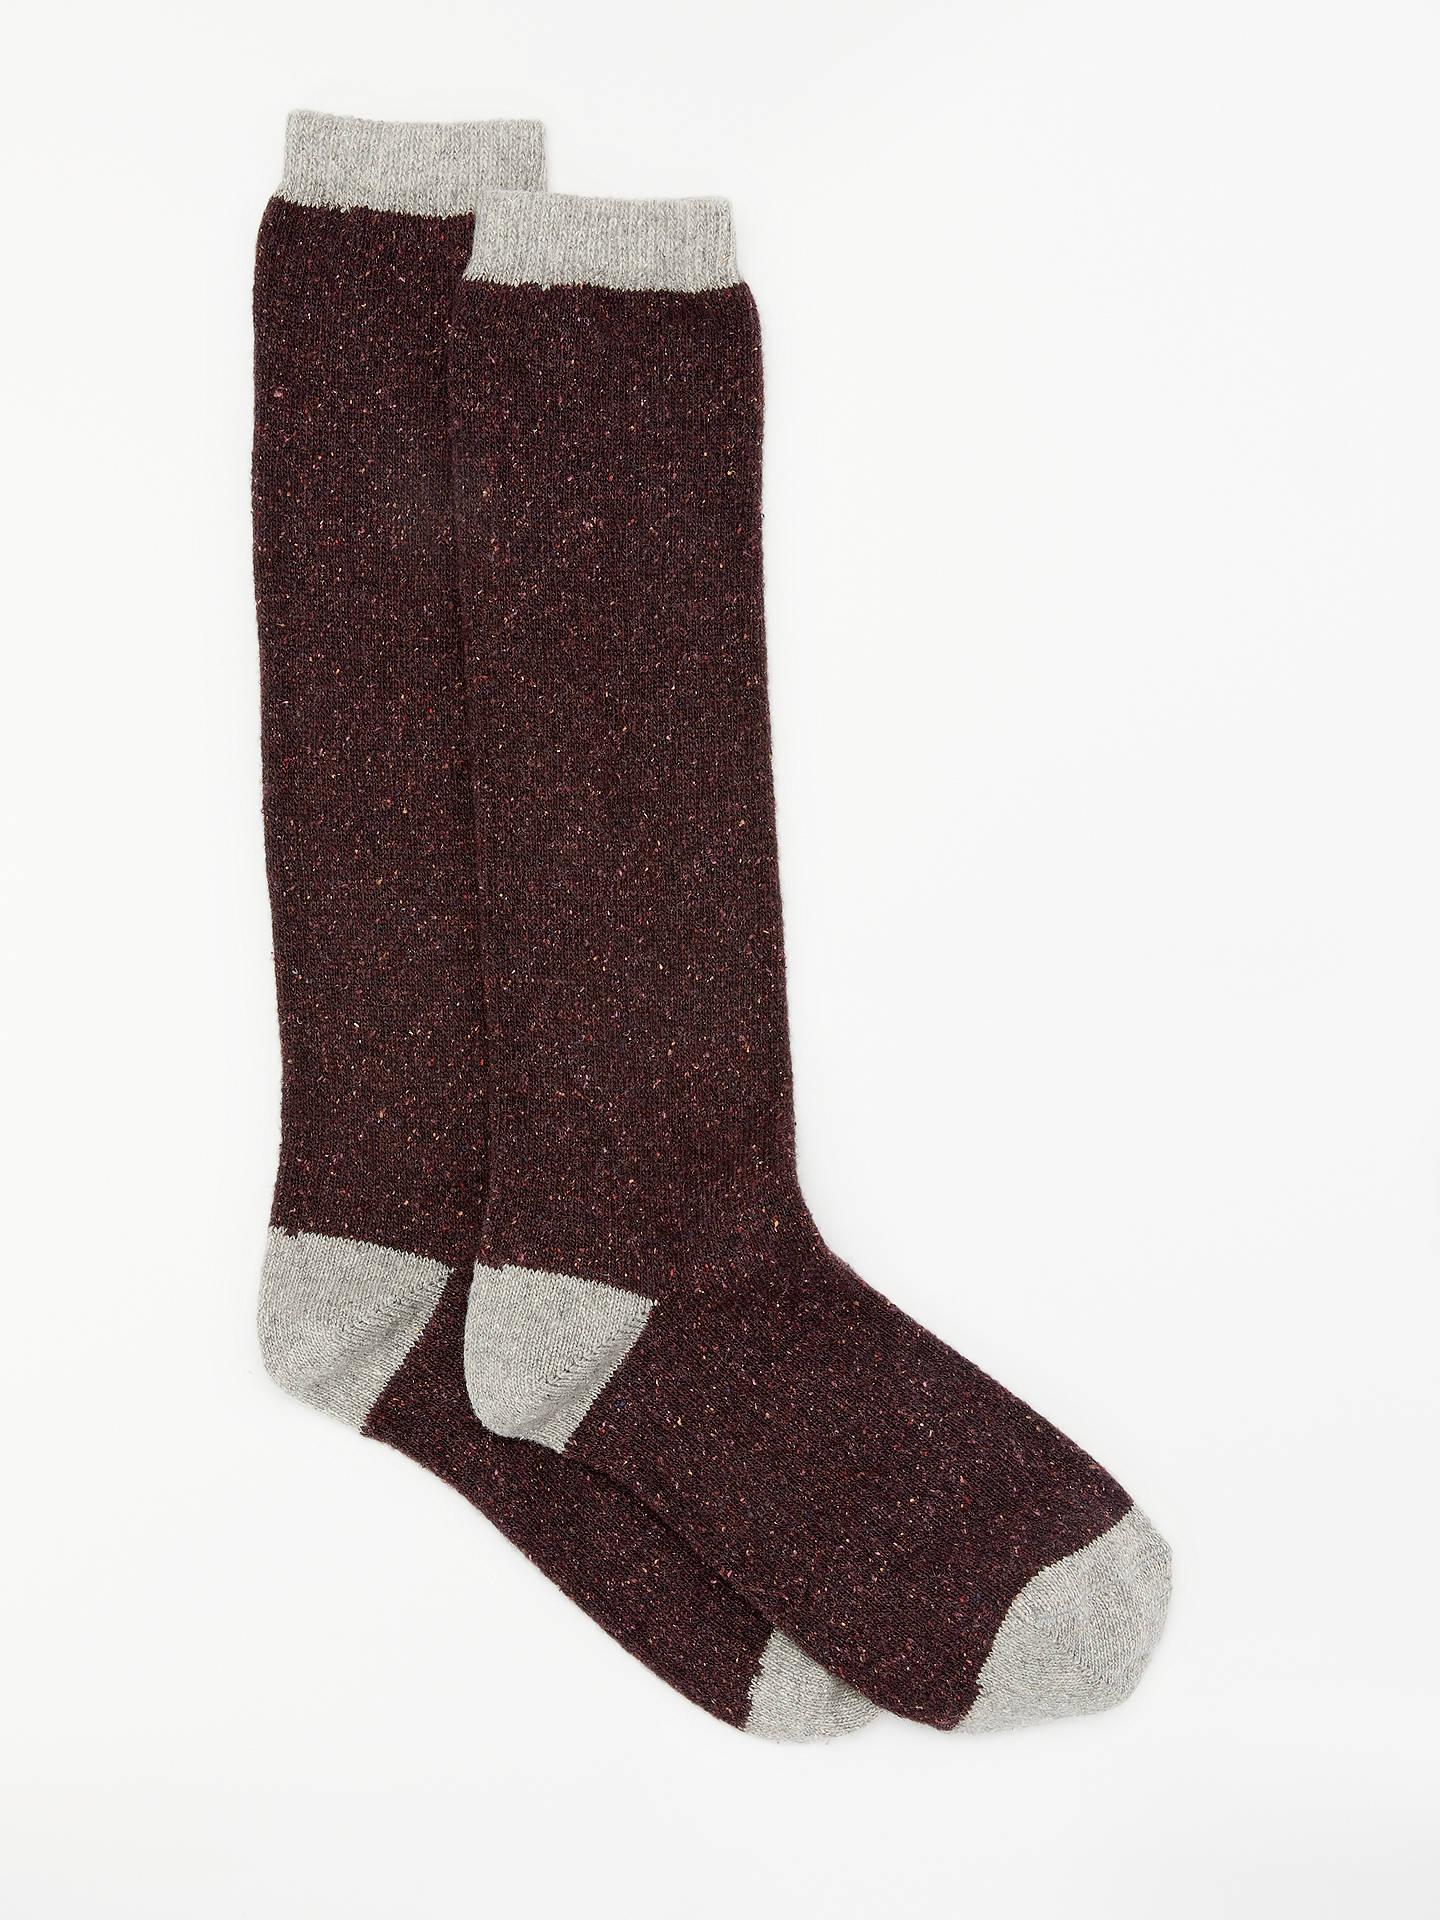 85c88be6f95 Buy John Lewis   Partners Wool and Silk Blend Knee High Socks